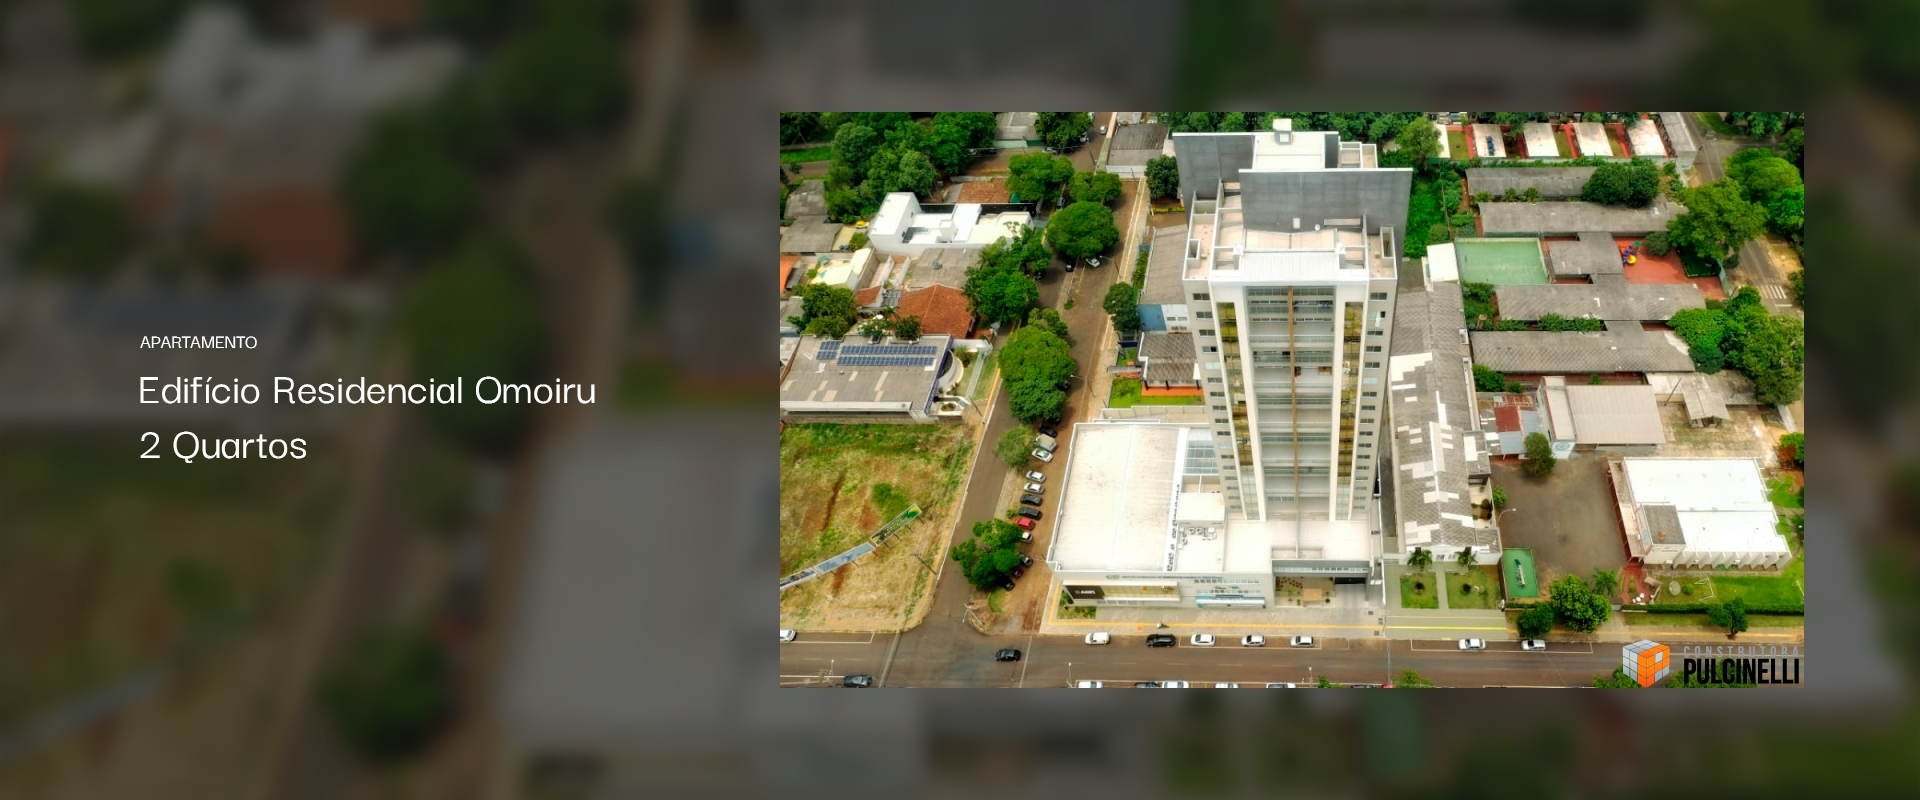 APARTAMENTO_ Edifício Residencial Omoiru...